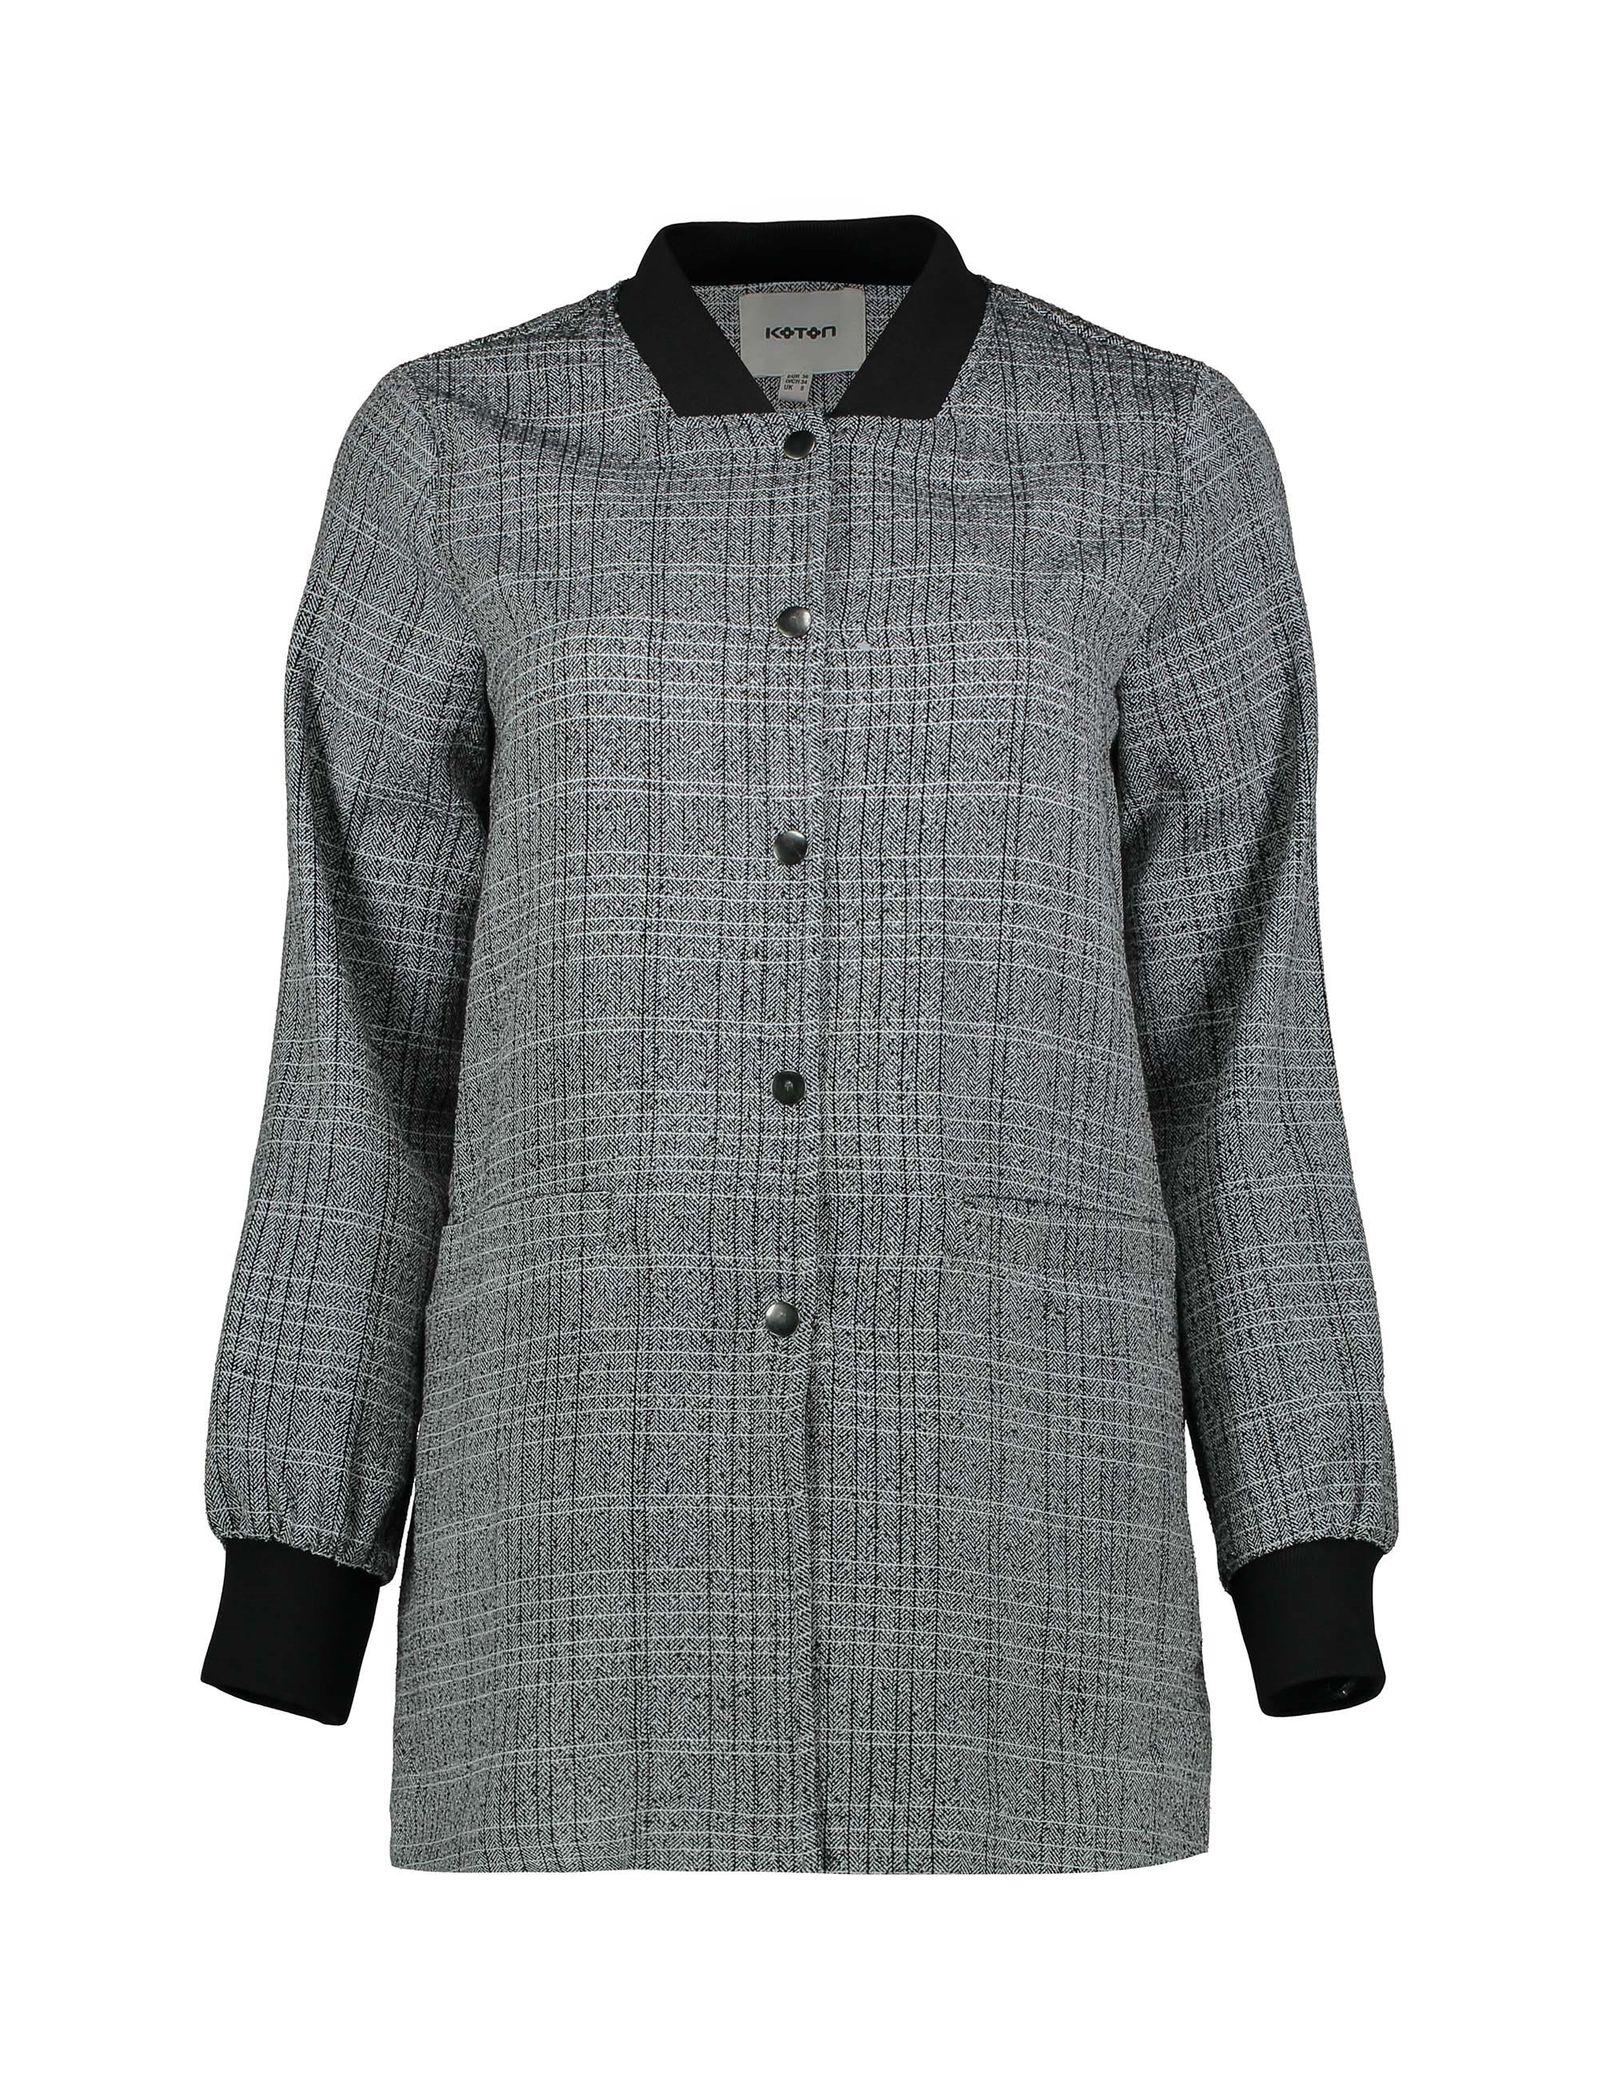 کت ویسکوز بلند زنانه - کوتون - طوسي - 1